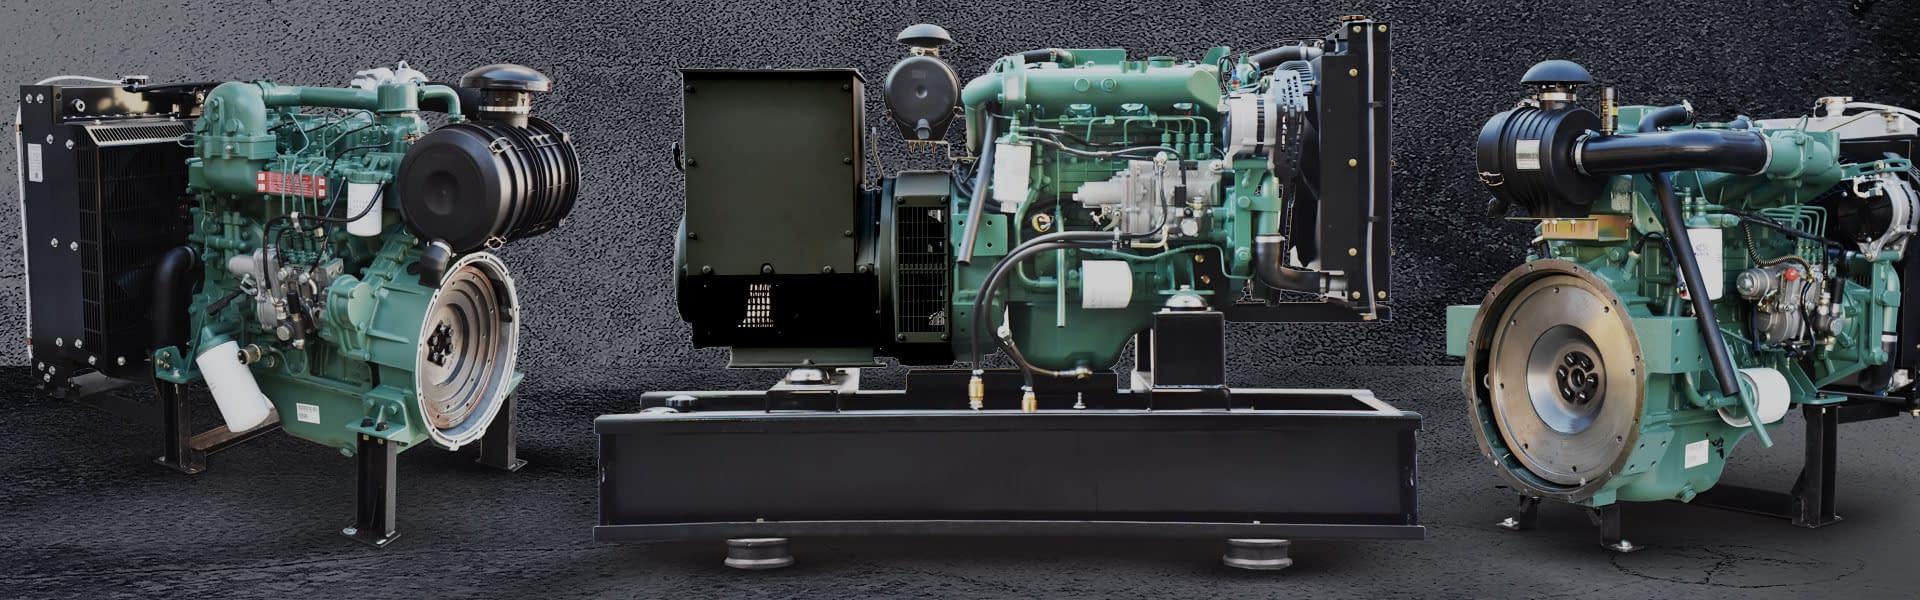 Diesel Generator Engines for Sale | Generators Engines South Africa | Generator King